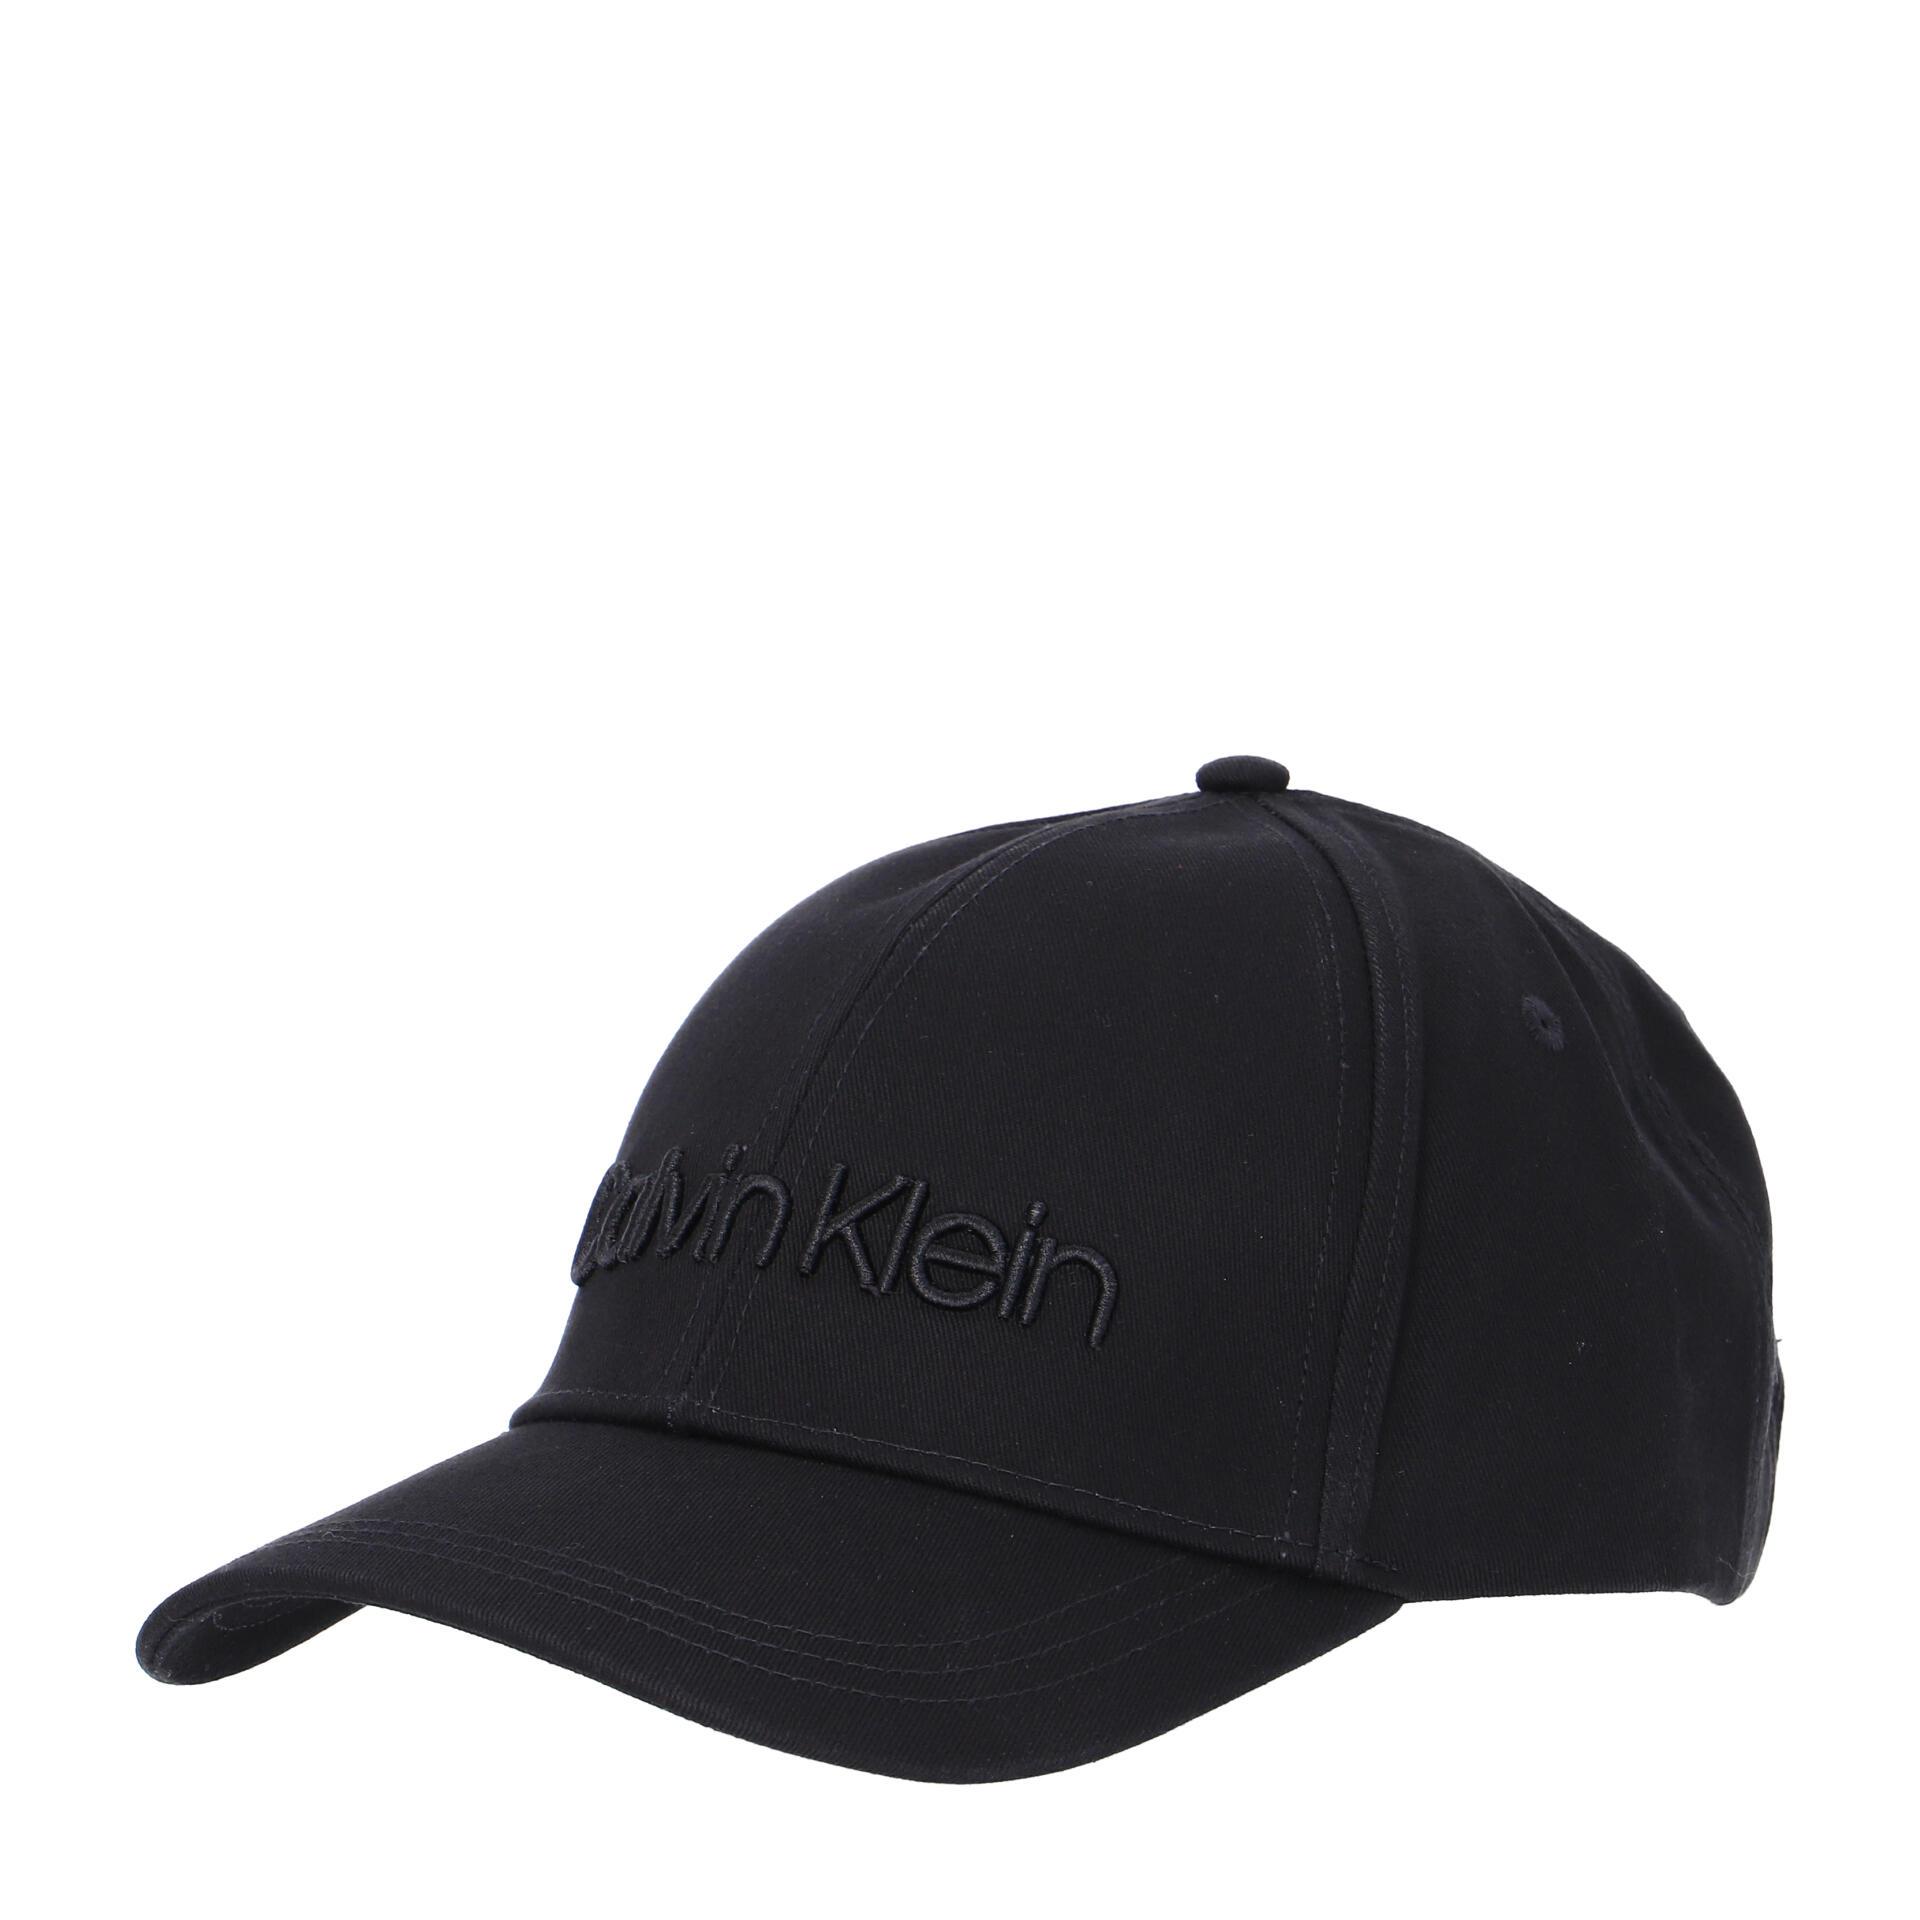 Embroidery Kappe black